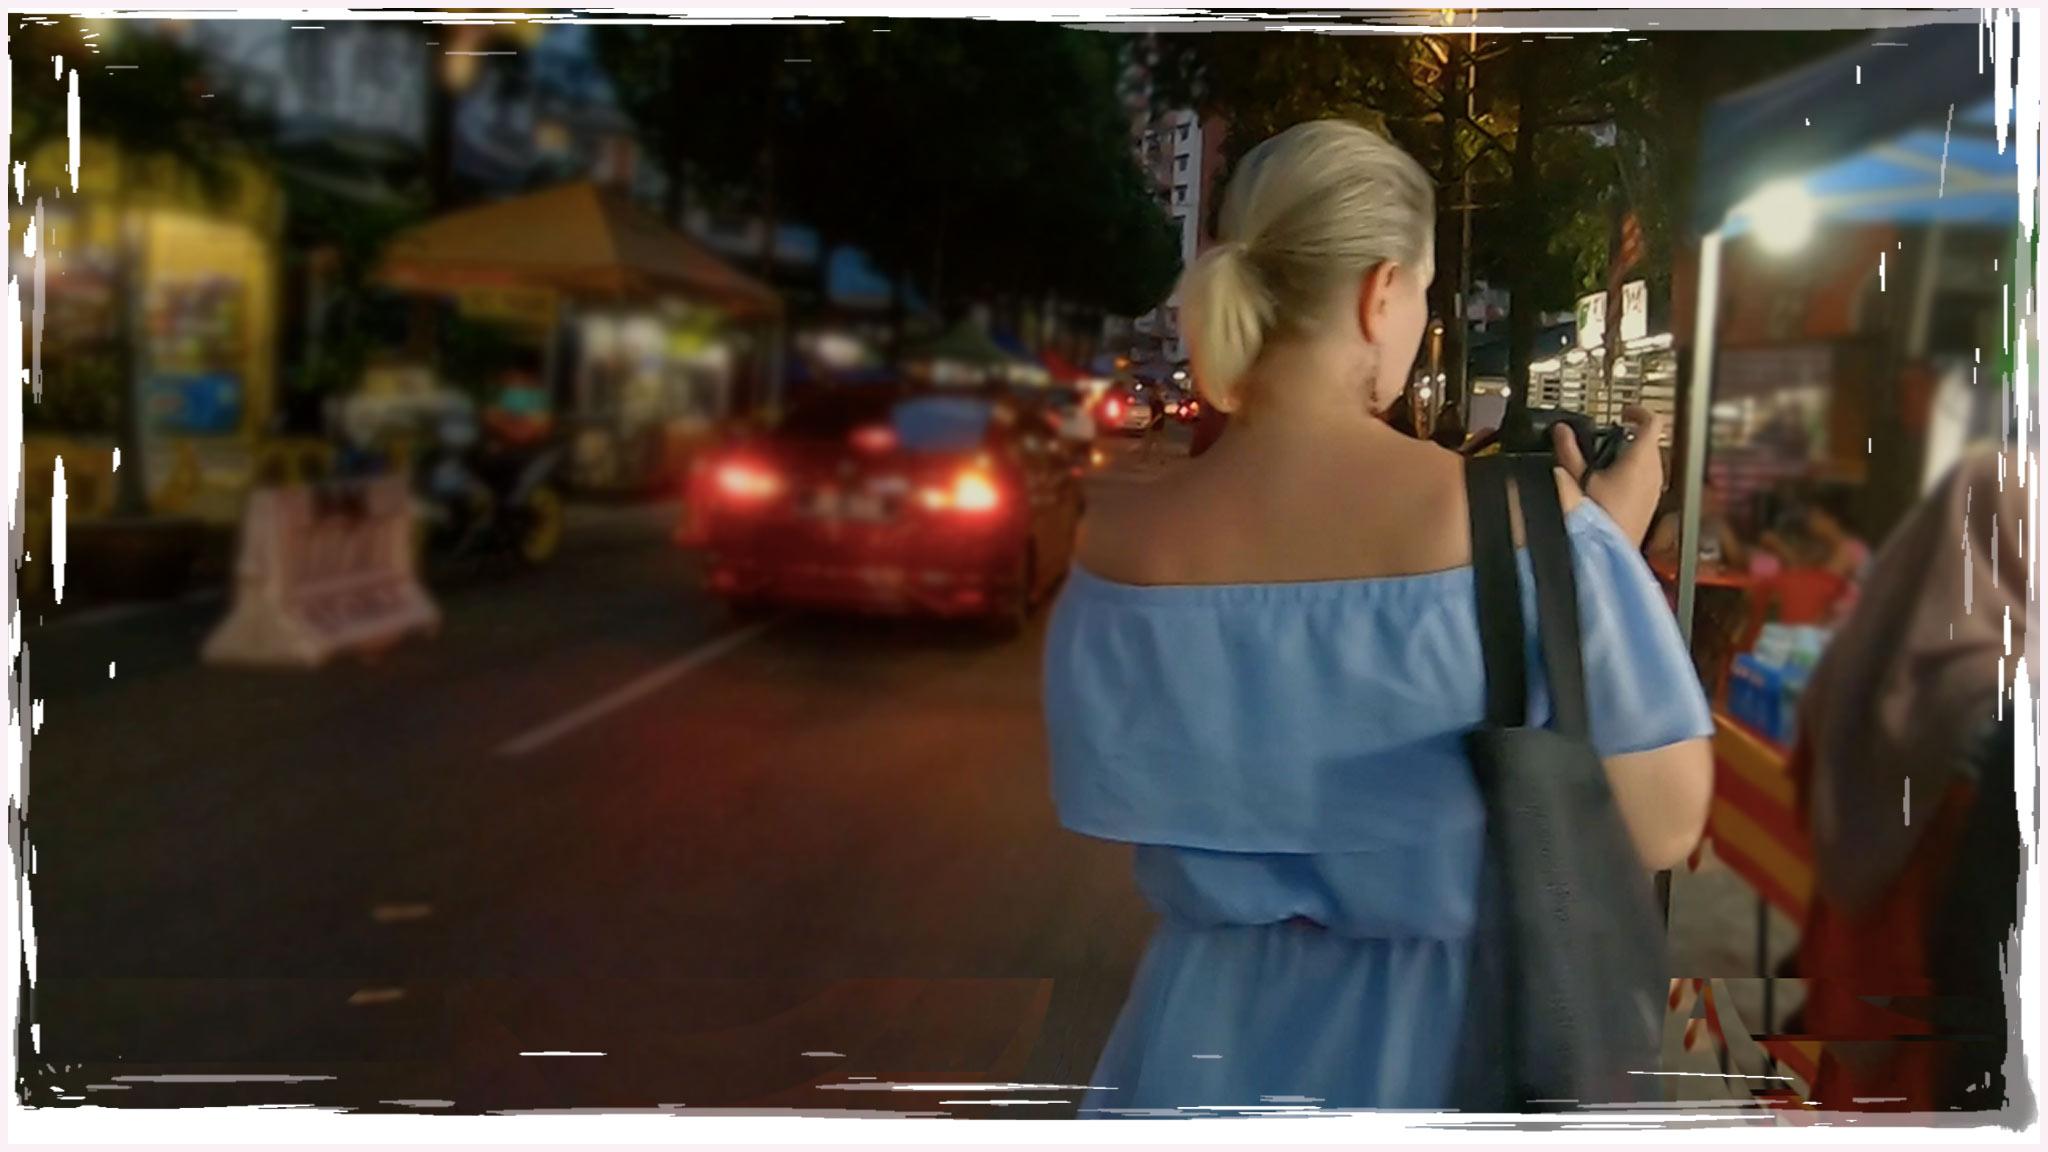 Kuala Lumpur Kampung Baru 2-Minute Vlog